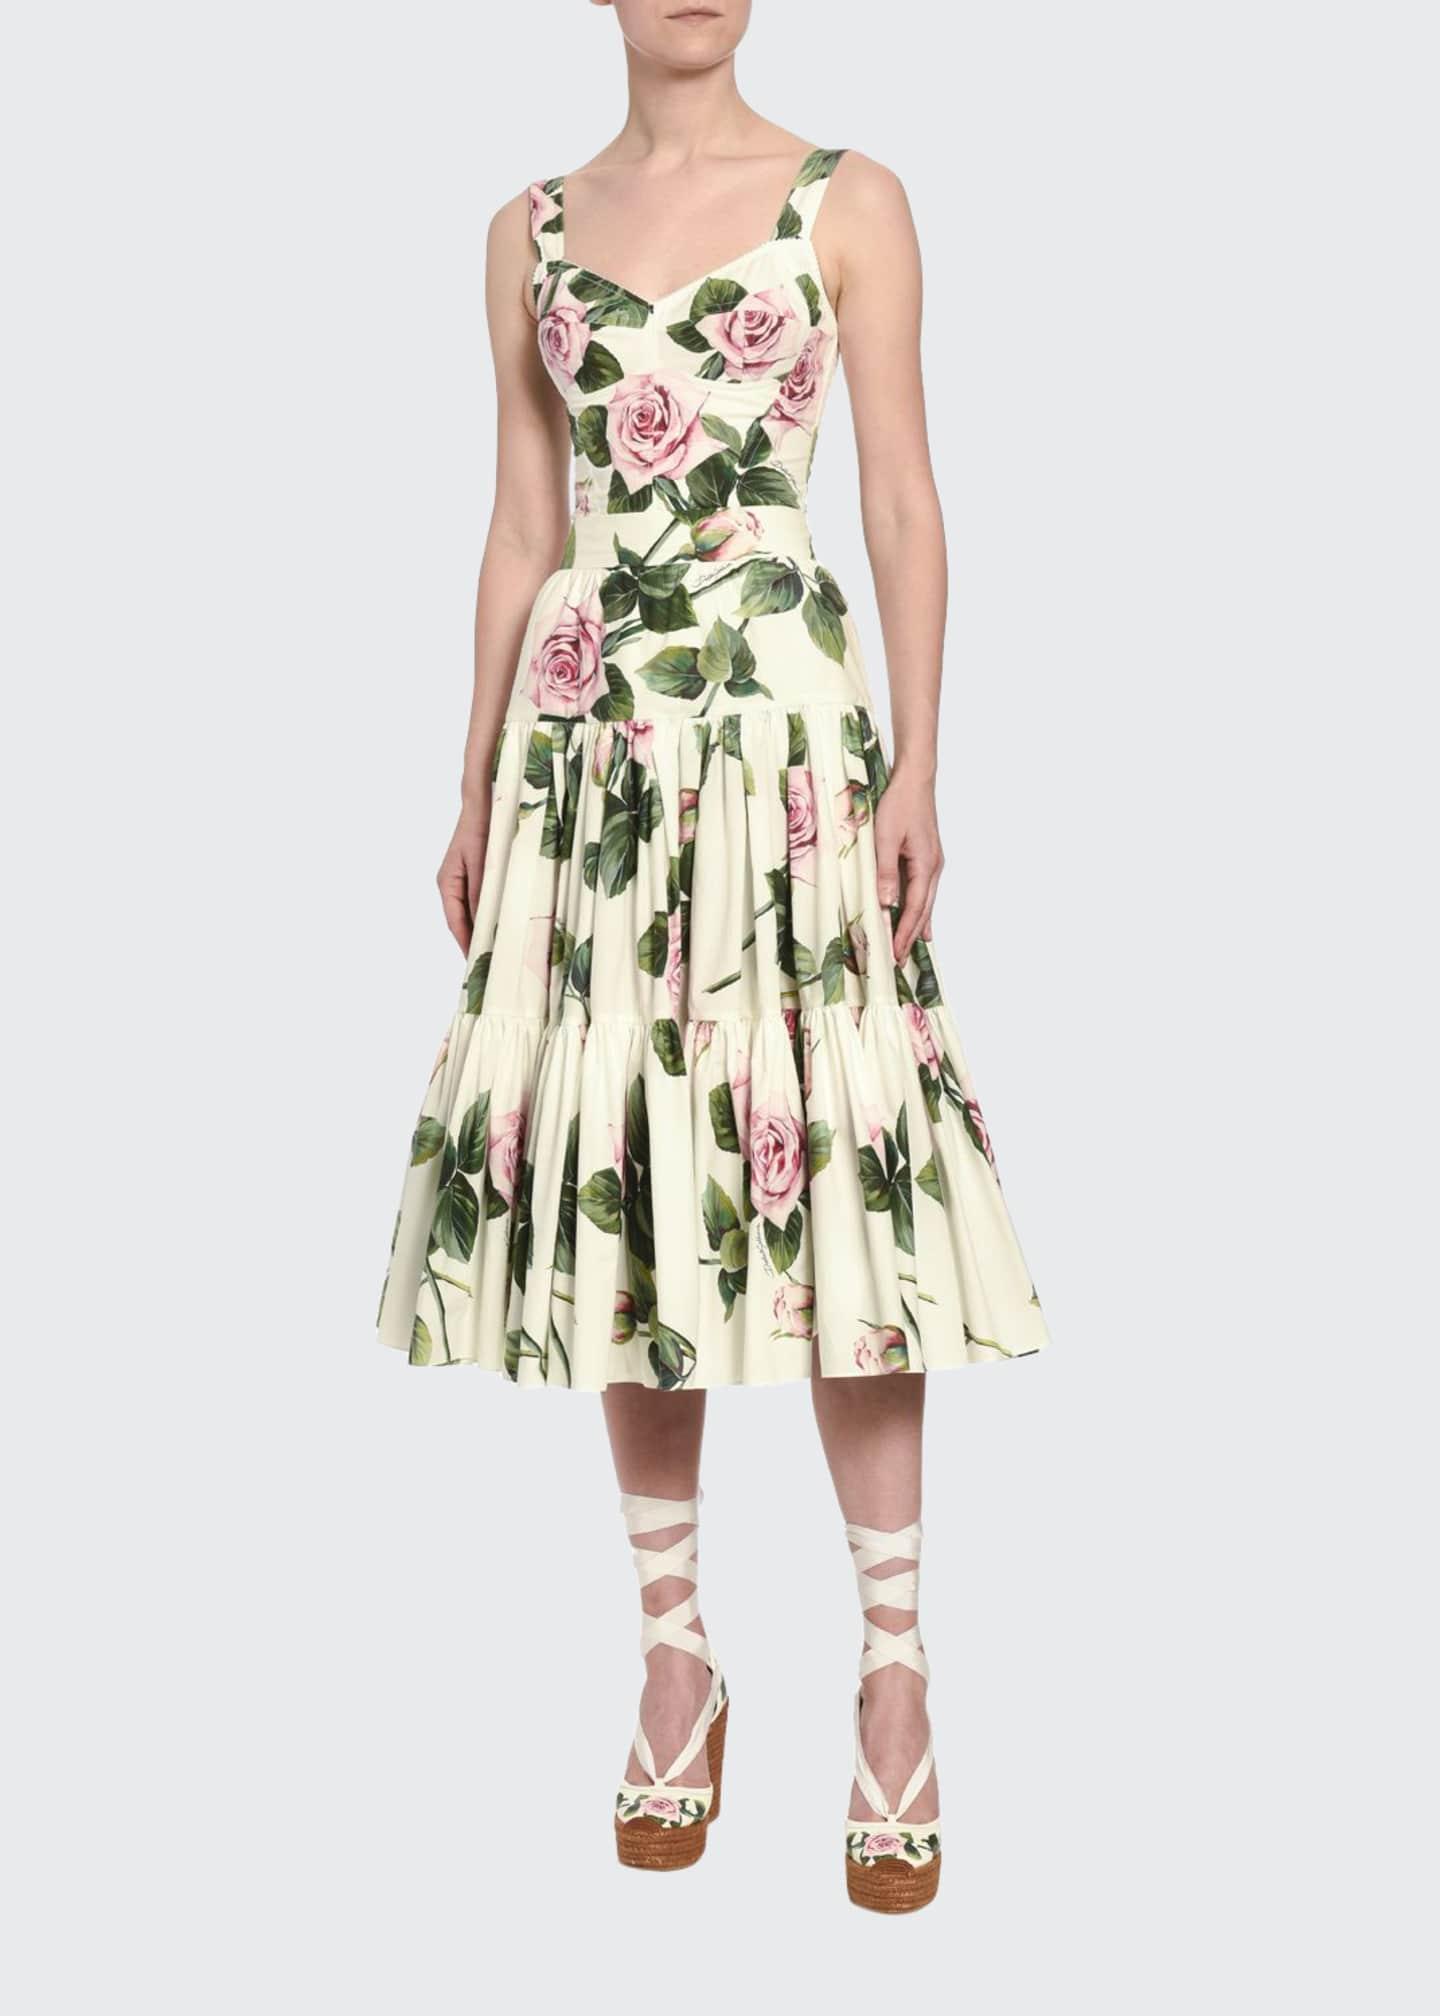 Dolce & Gabbana Floral-Print Poplin Corset Top